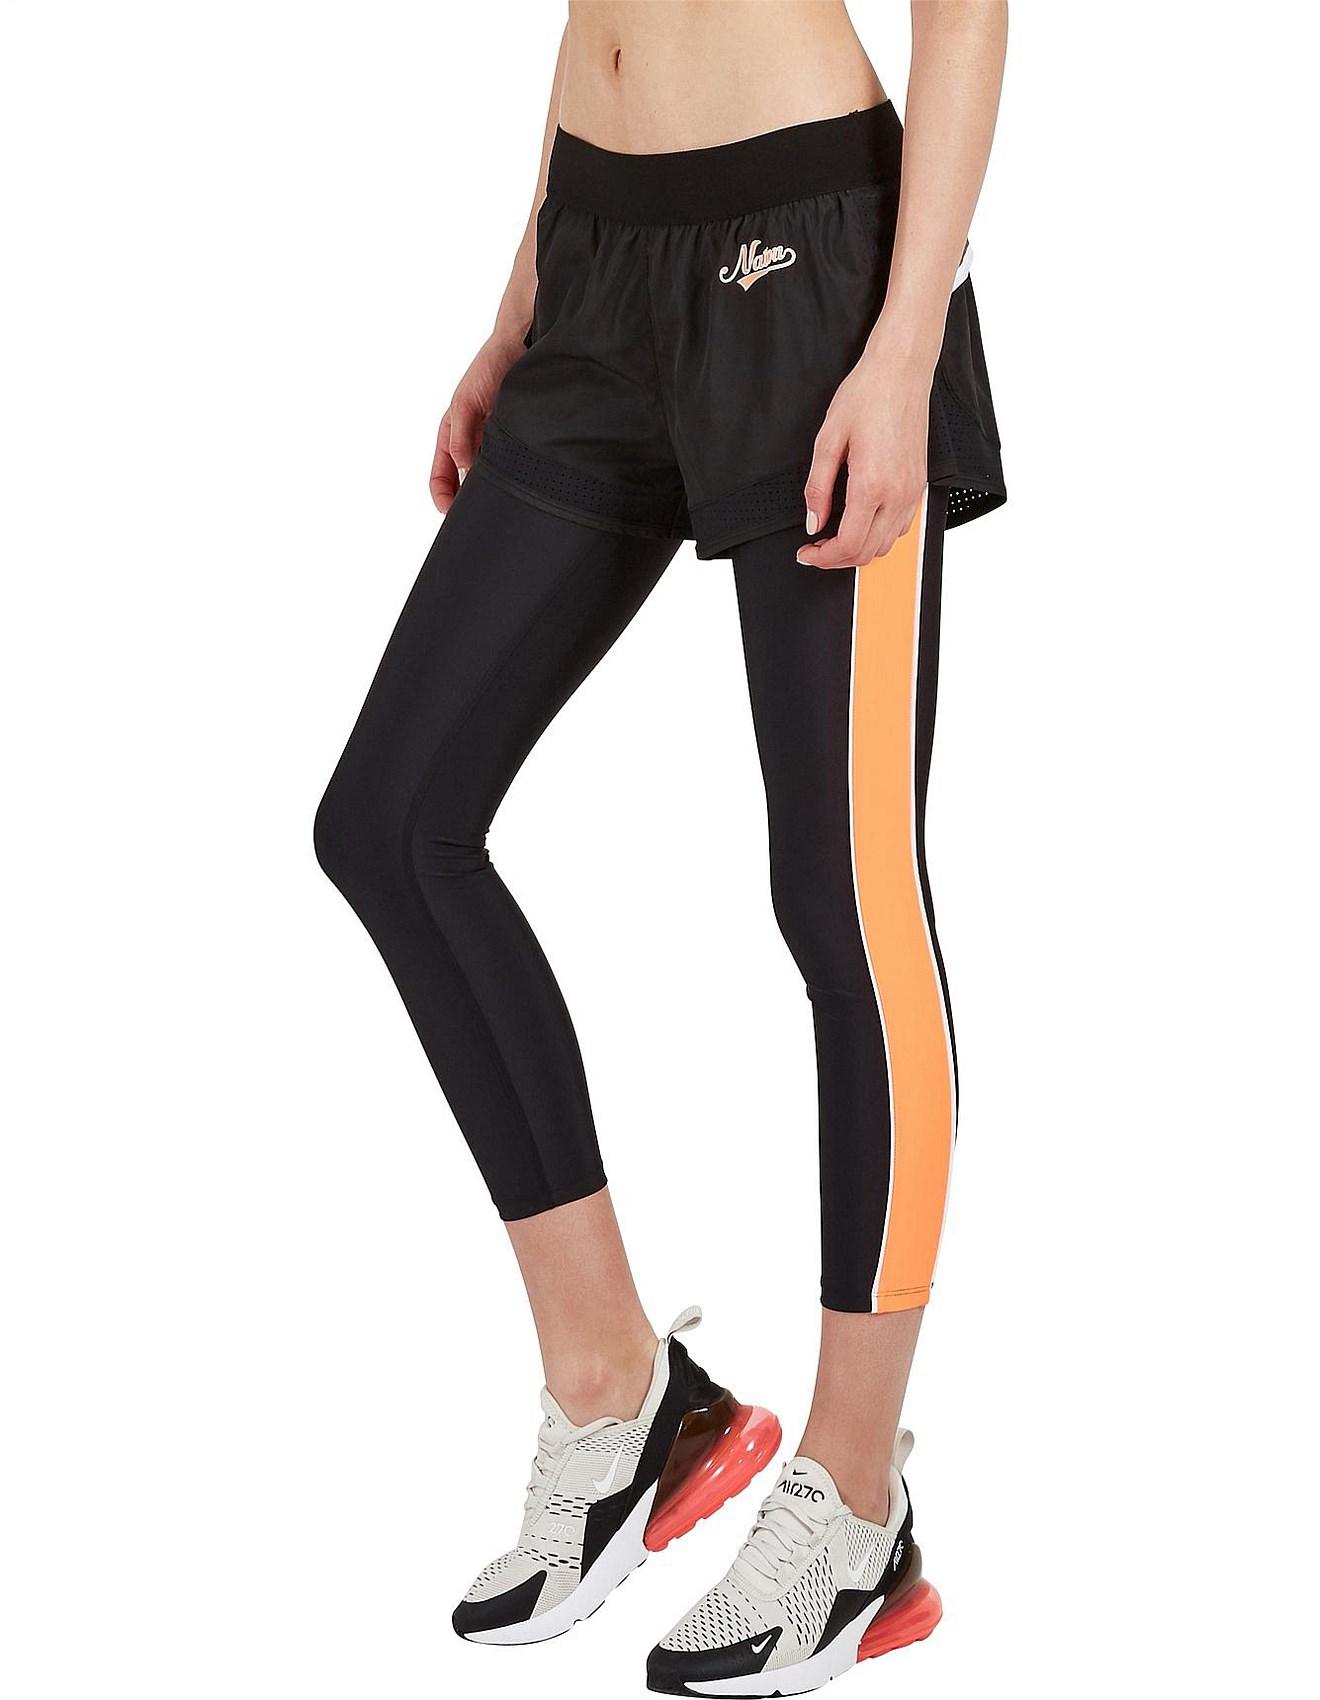 2bacc2114d430 Activewear & Gym Wear Sale   Women's Activewear   David Jones - Long Lift  Legging